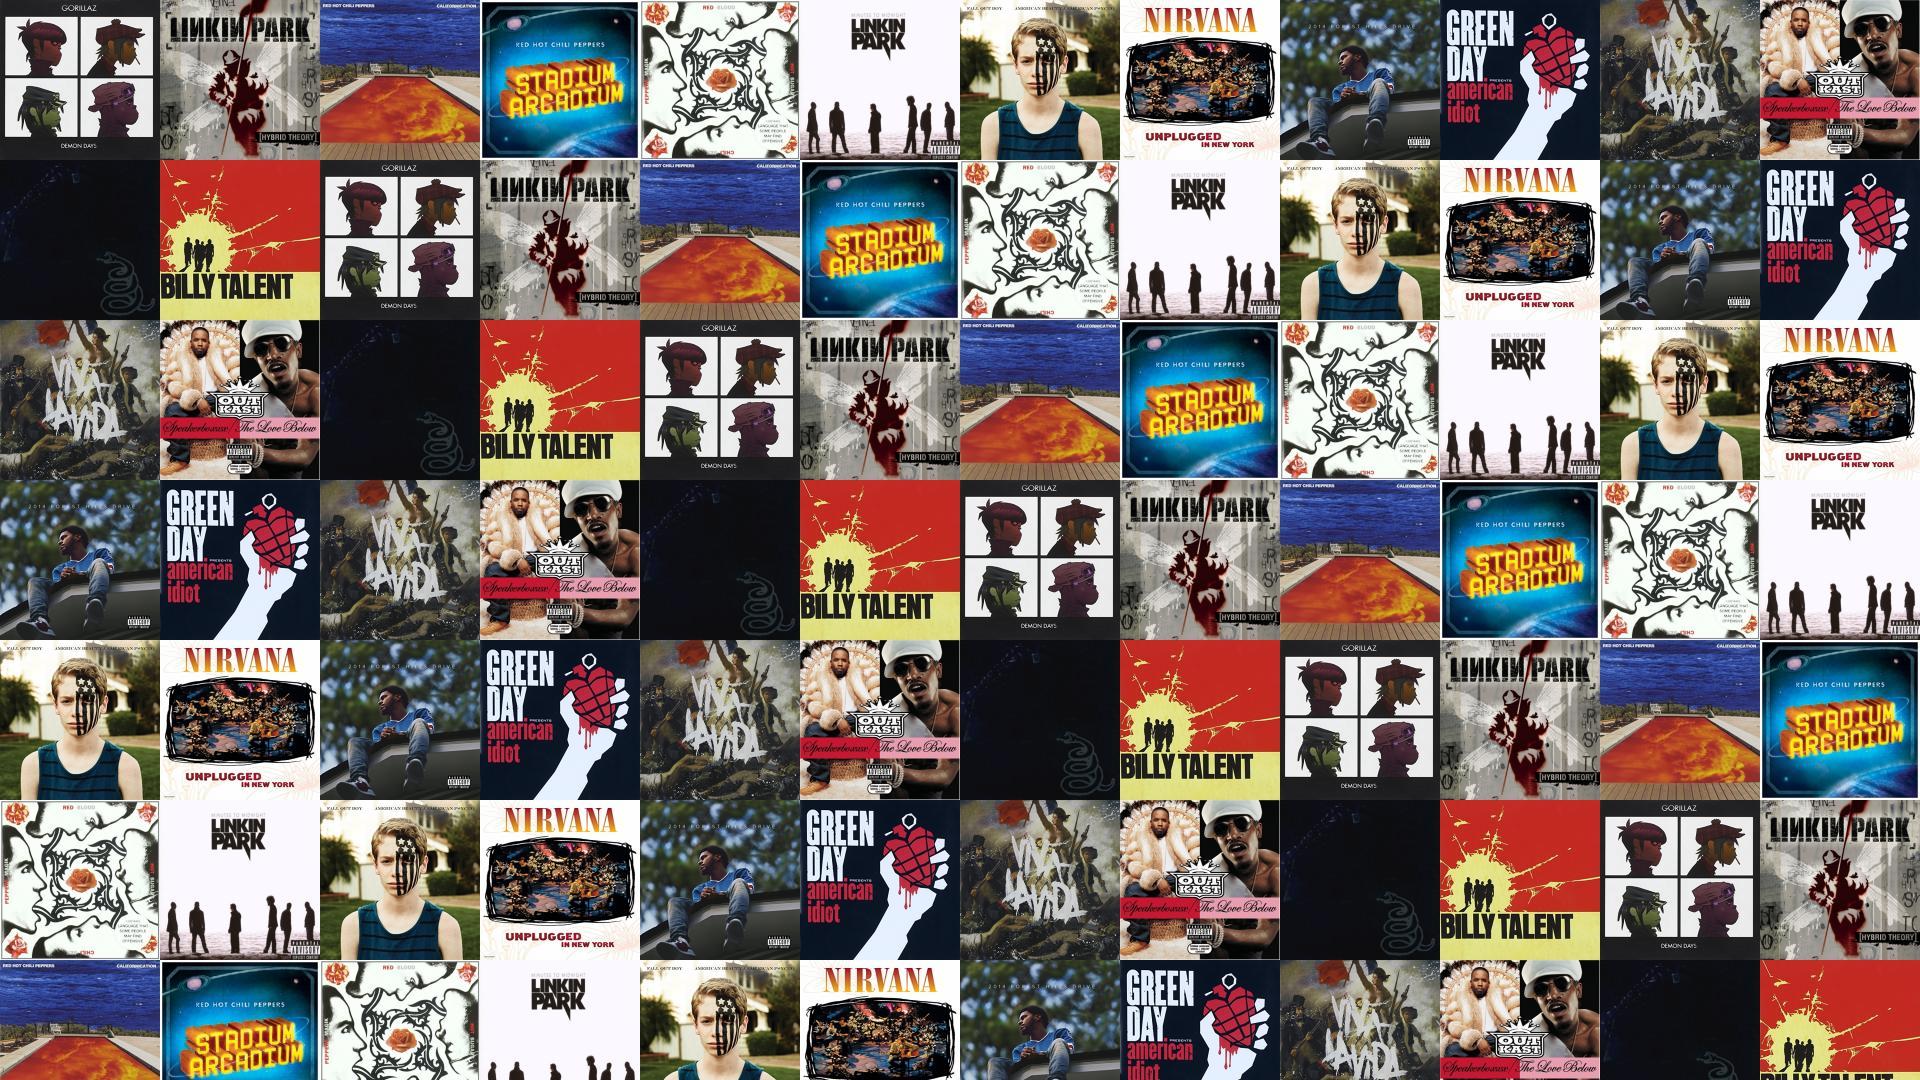 Gorillaz Demon Days Linkin Park Hybrid Theory Red Wallpaper Tiled